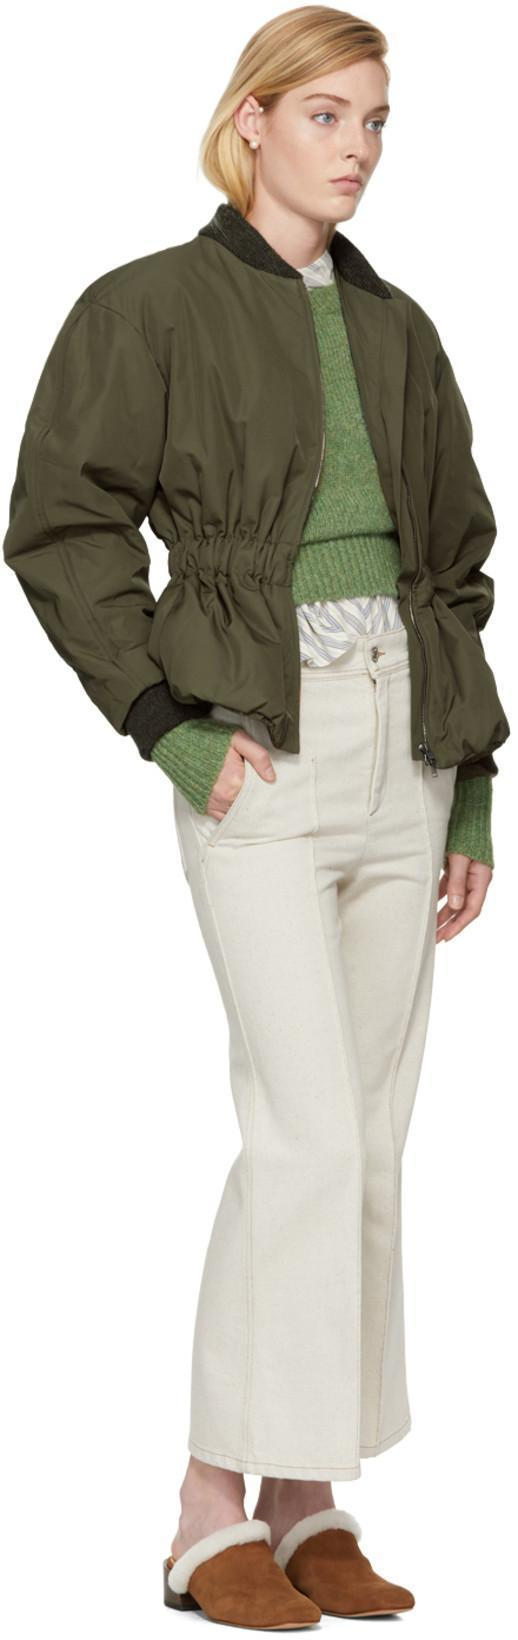 5e6899cf3 Isabel Marant Dex Short Bomber-Style Jacket In Green | ModeSens